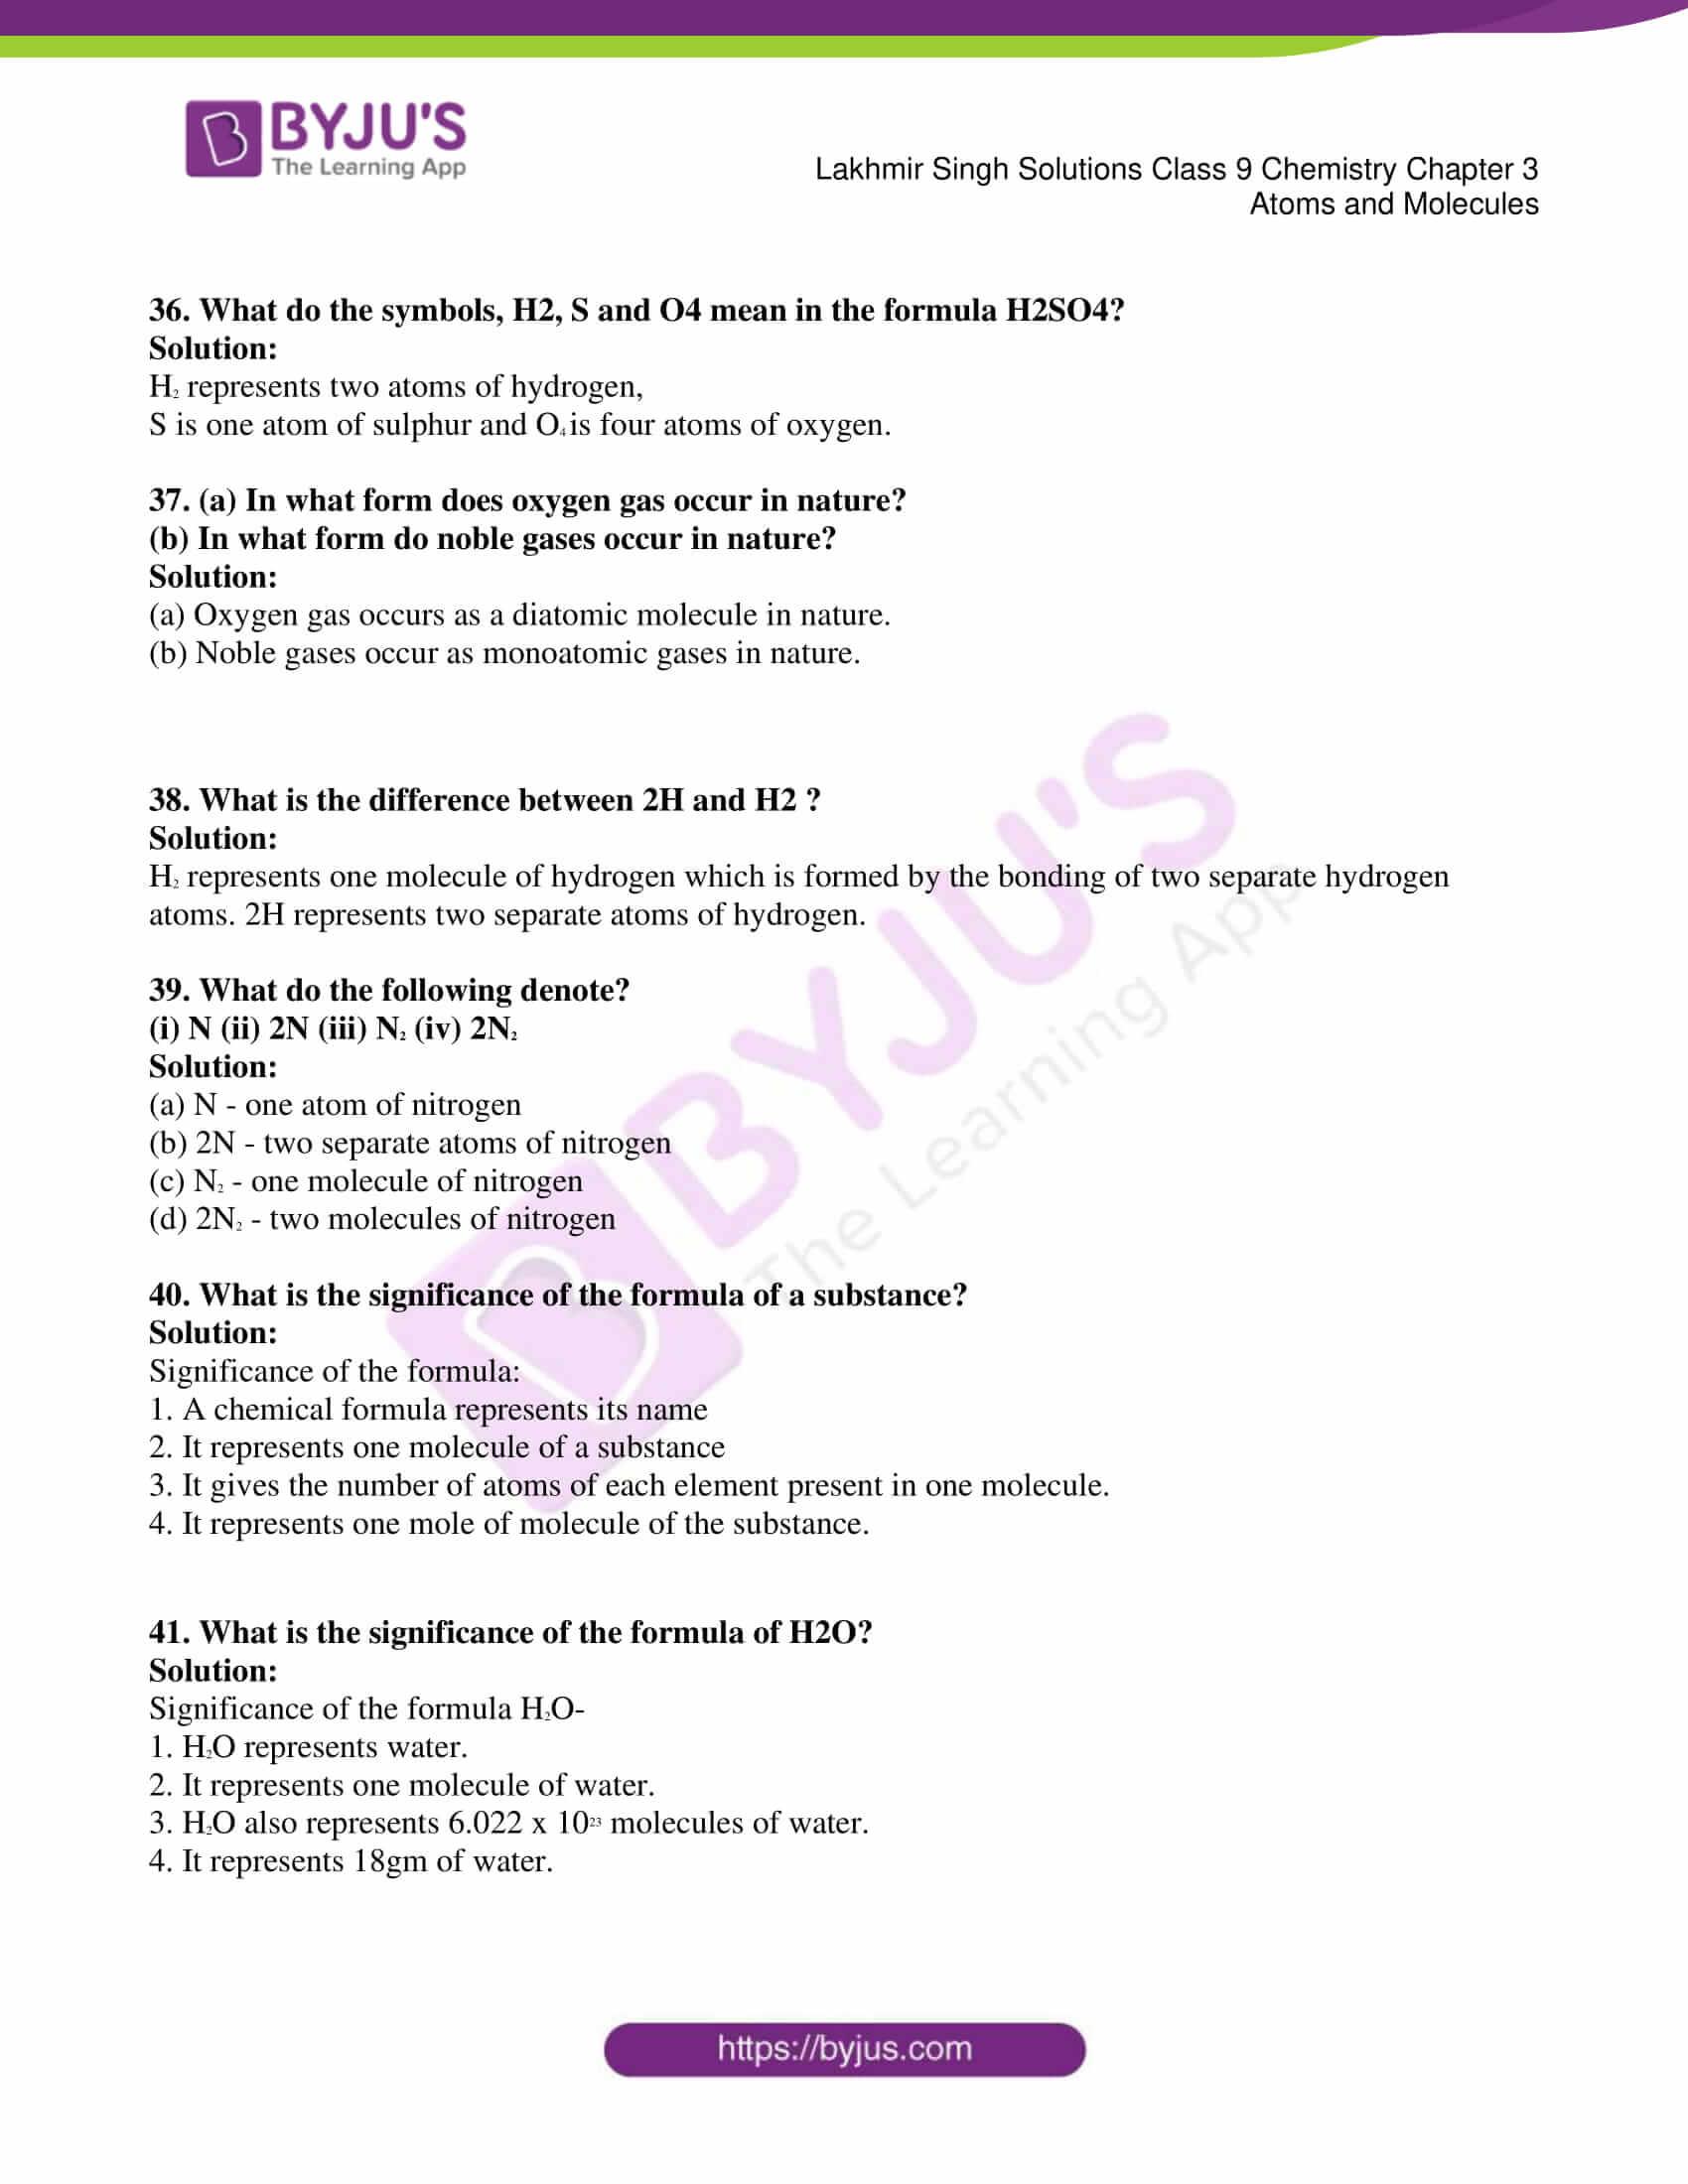 lakhmir singh solutions class 9 chemistry chapter 3 06